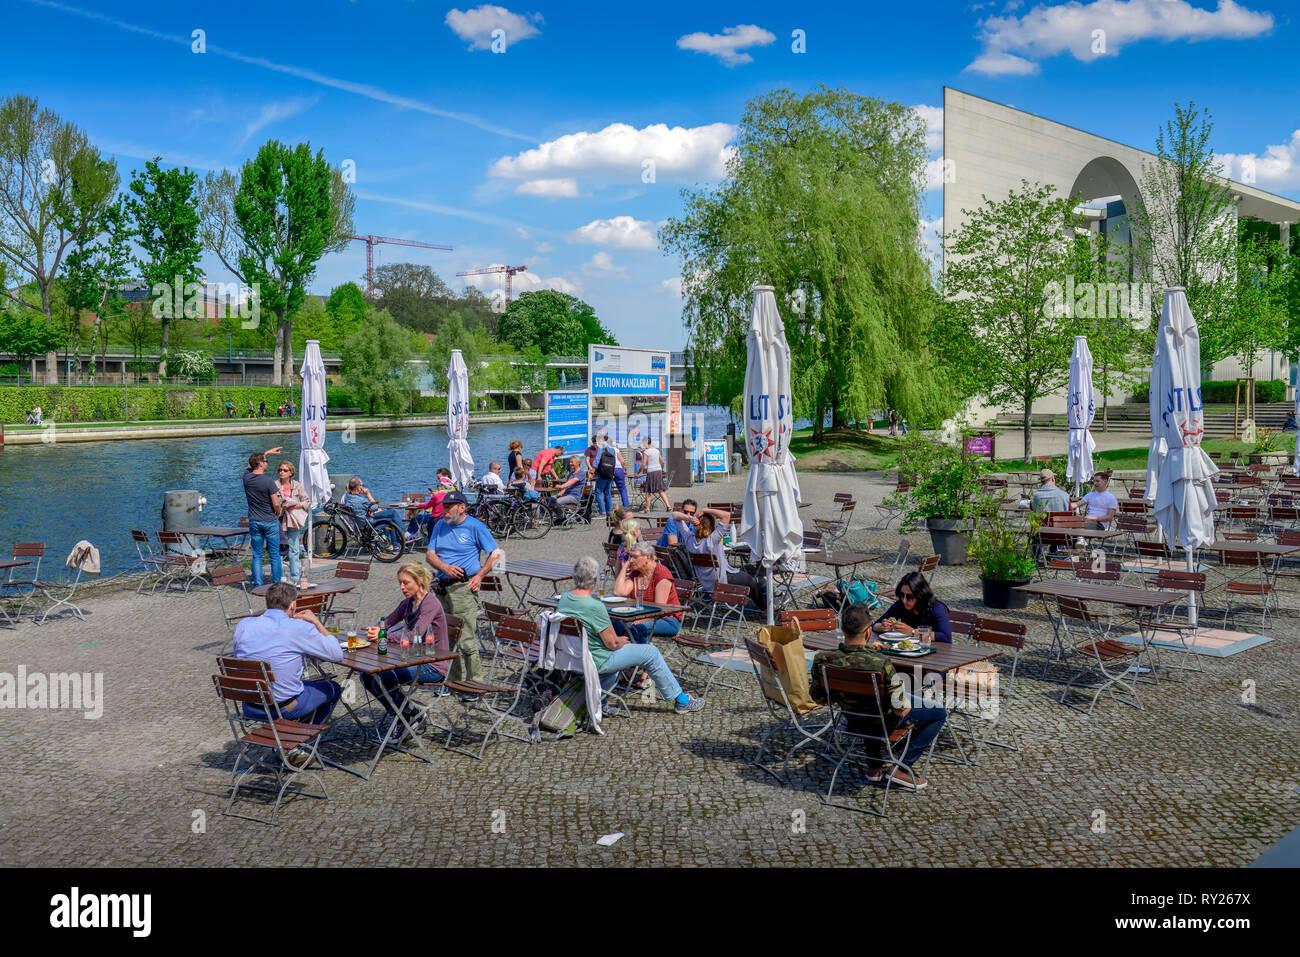 Biergarten, Haus der Kulturen der Welt, Tiergarten, Mitte, Berlin, Deutschland Photo Stock